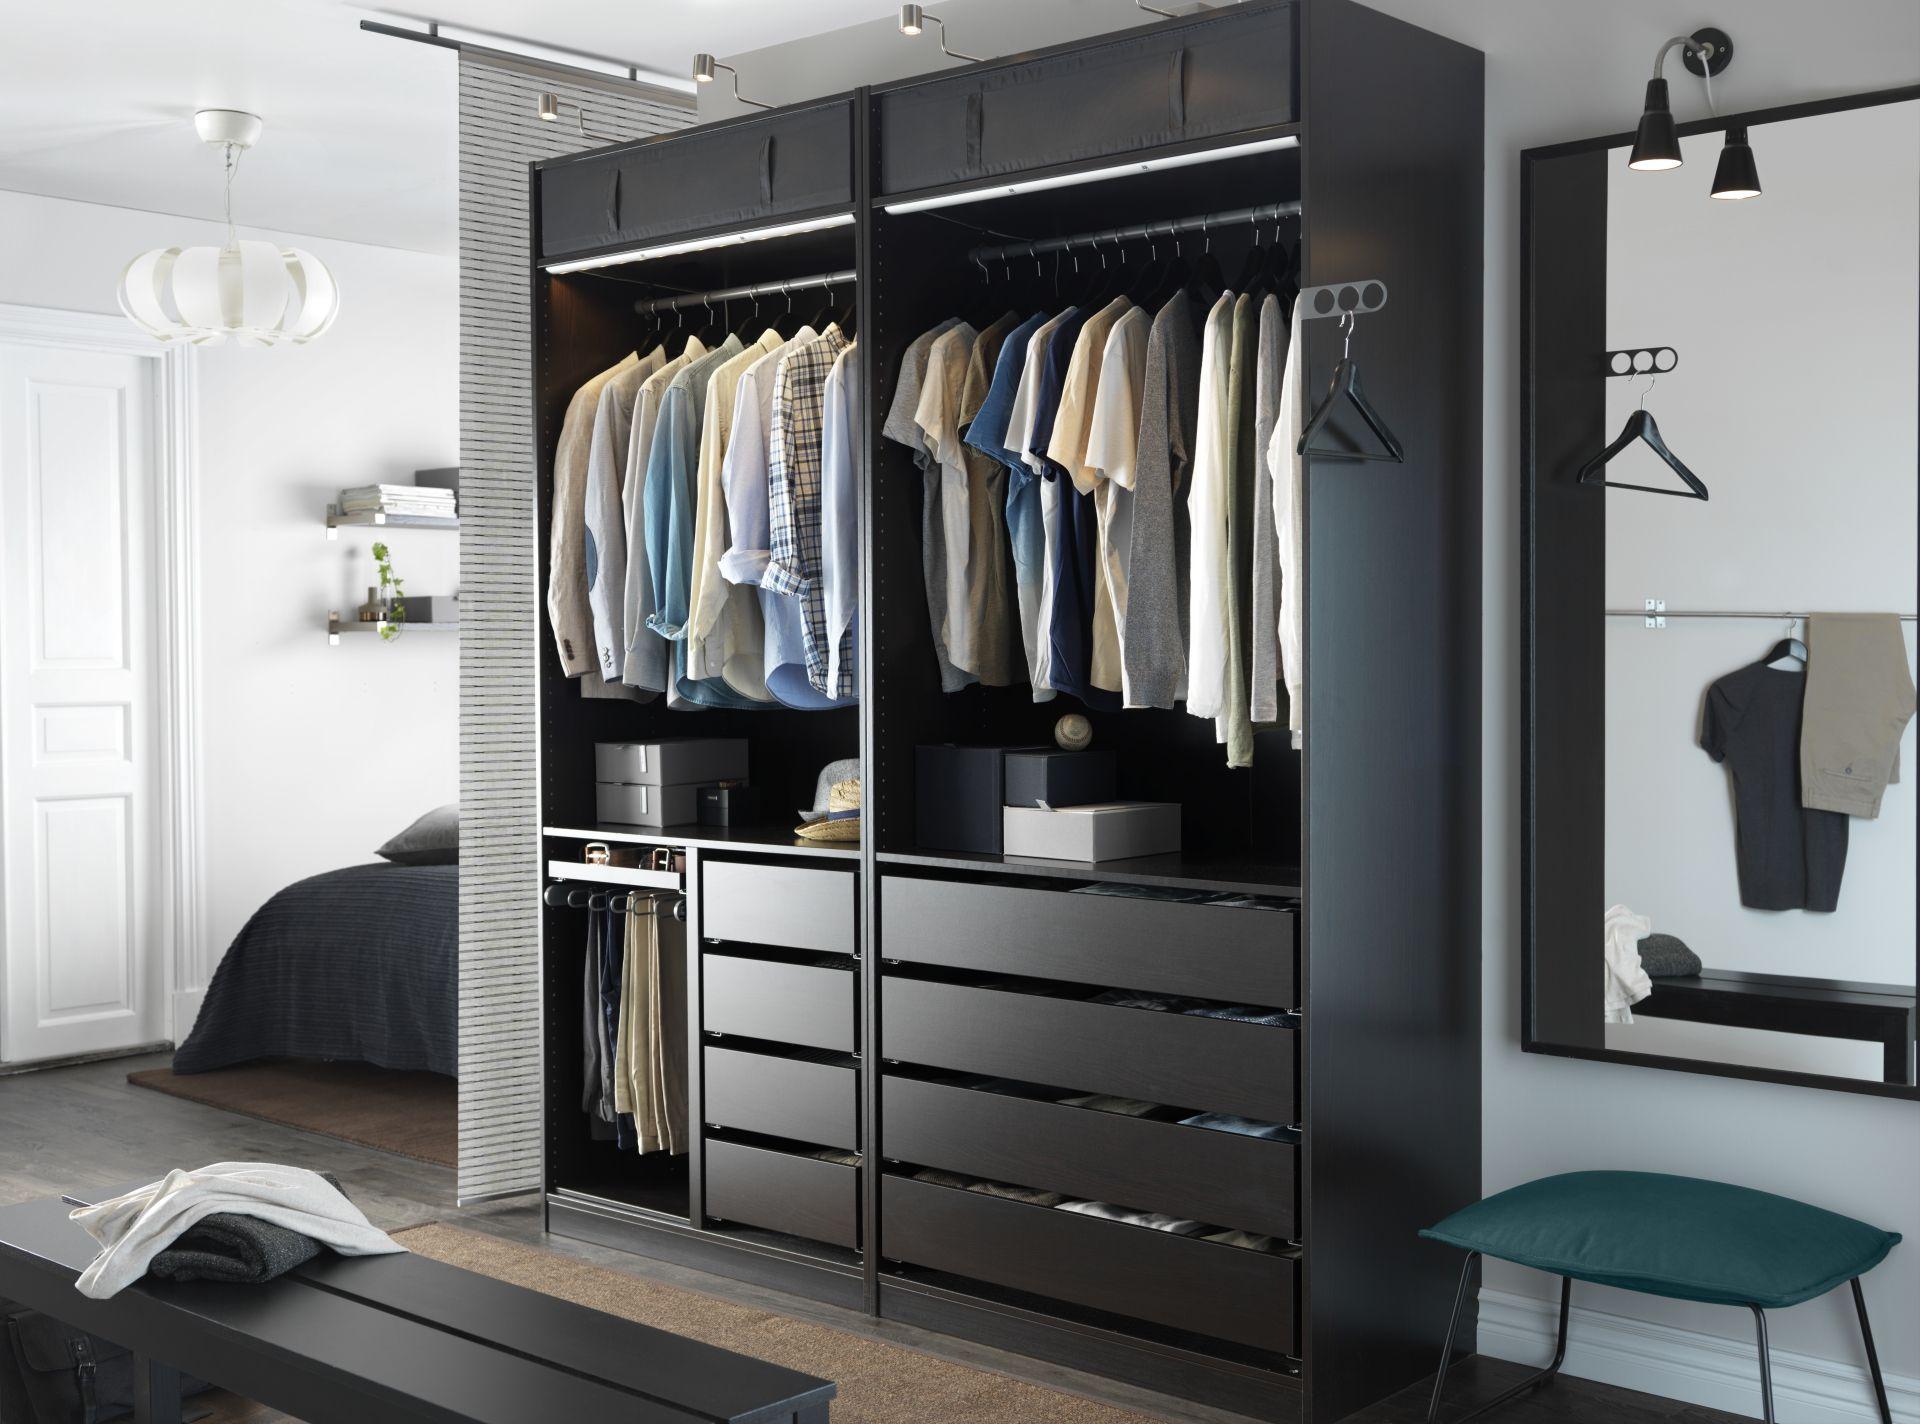 PAX garderobekast  IKEA IKEAnederland IKEAnl